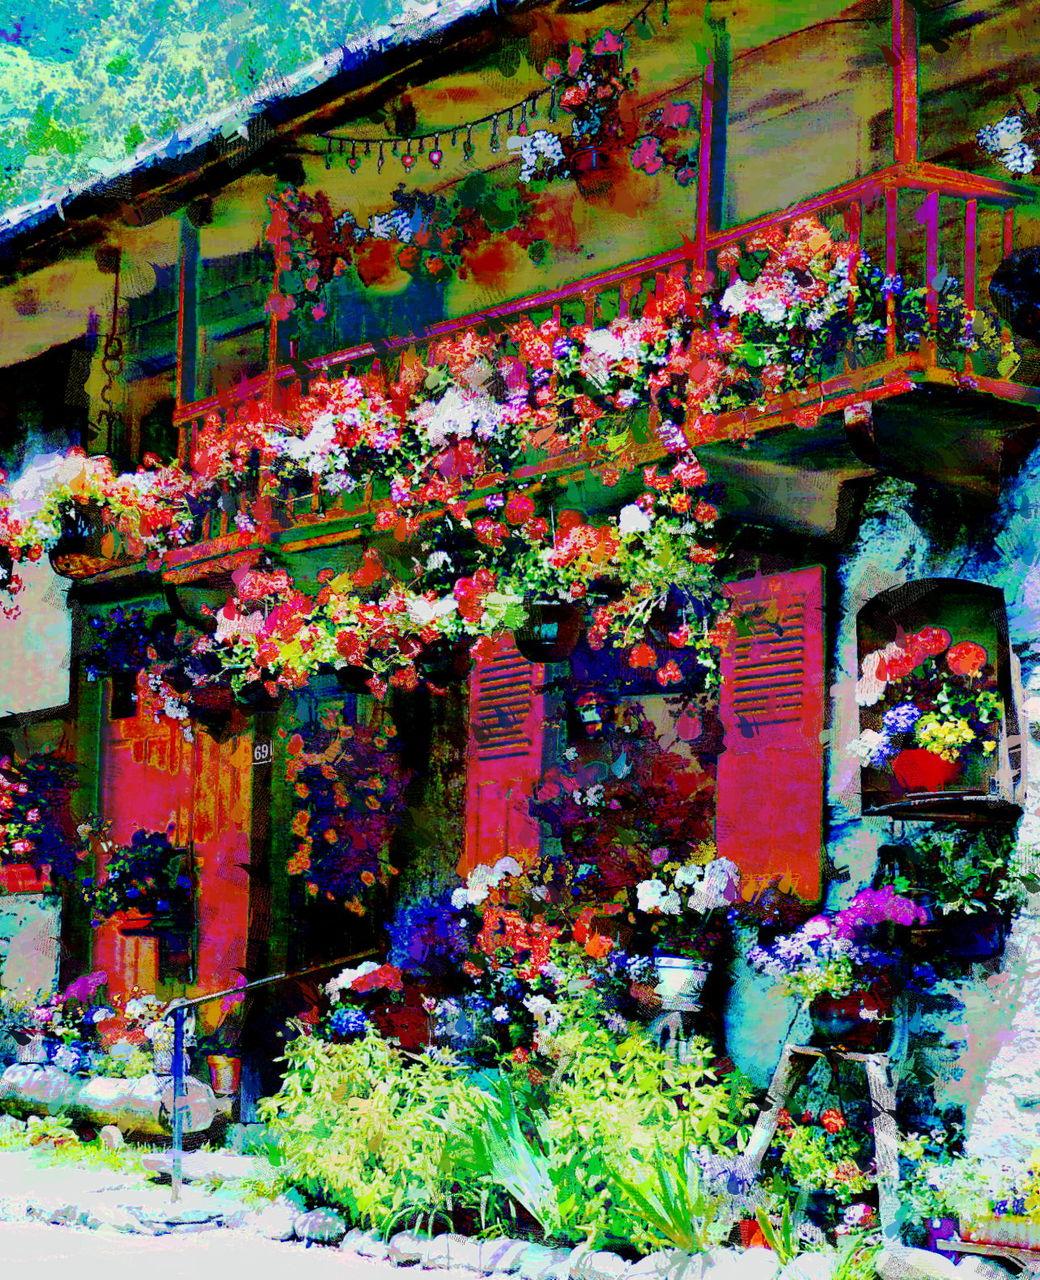 Danielle Arnal la maison fleurie